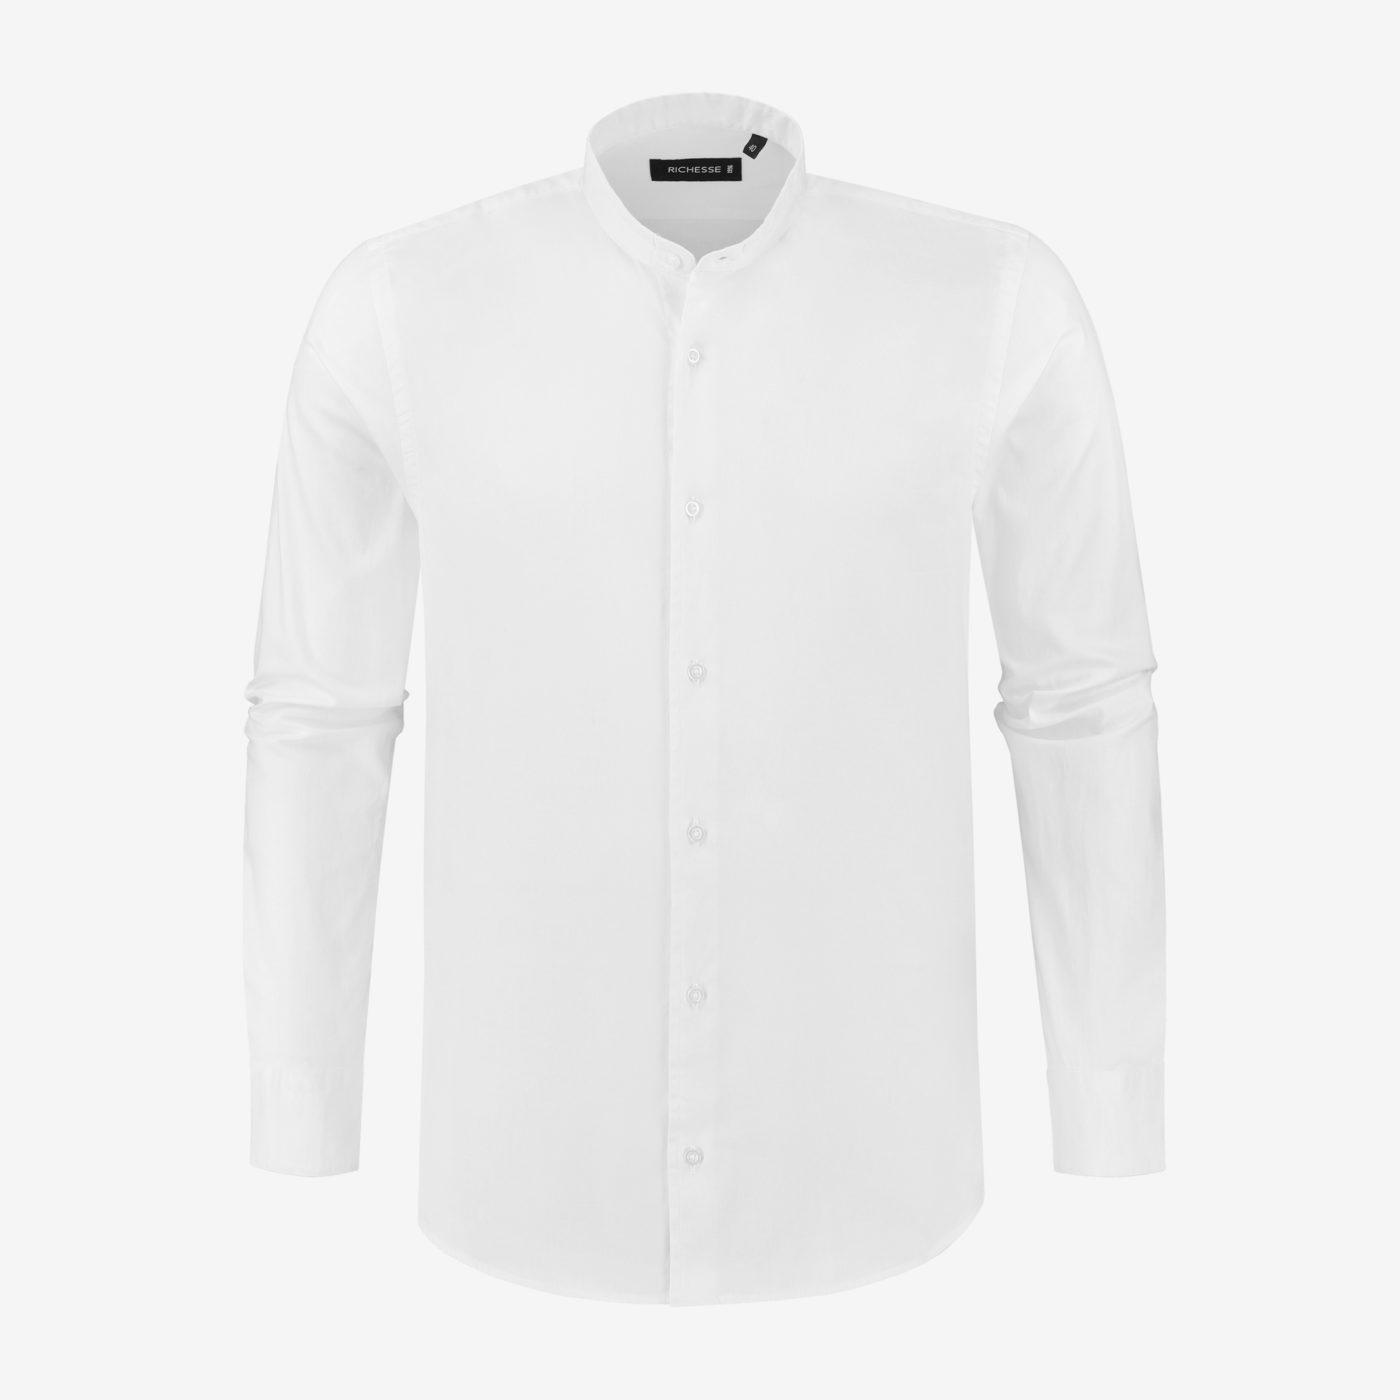 Richesse-Mandarin-White-Shirt_Front